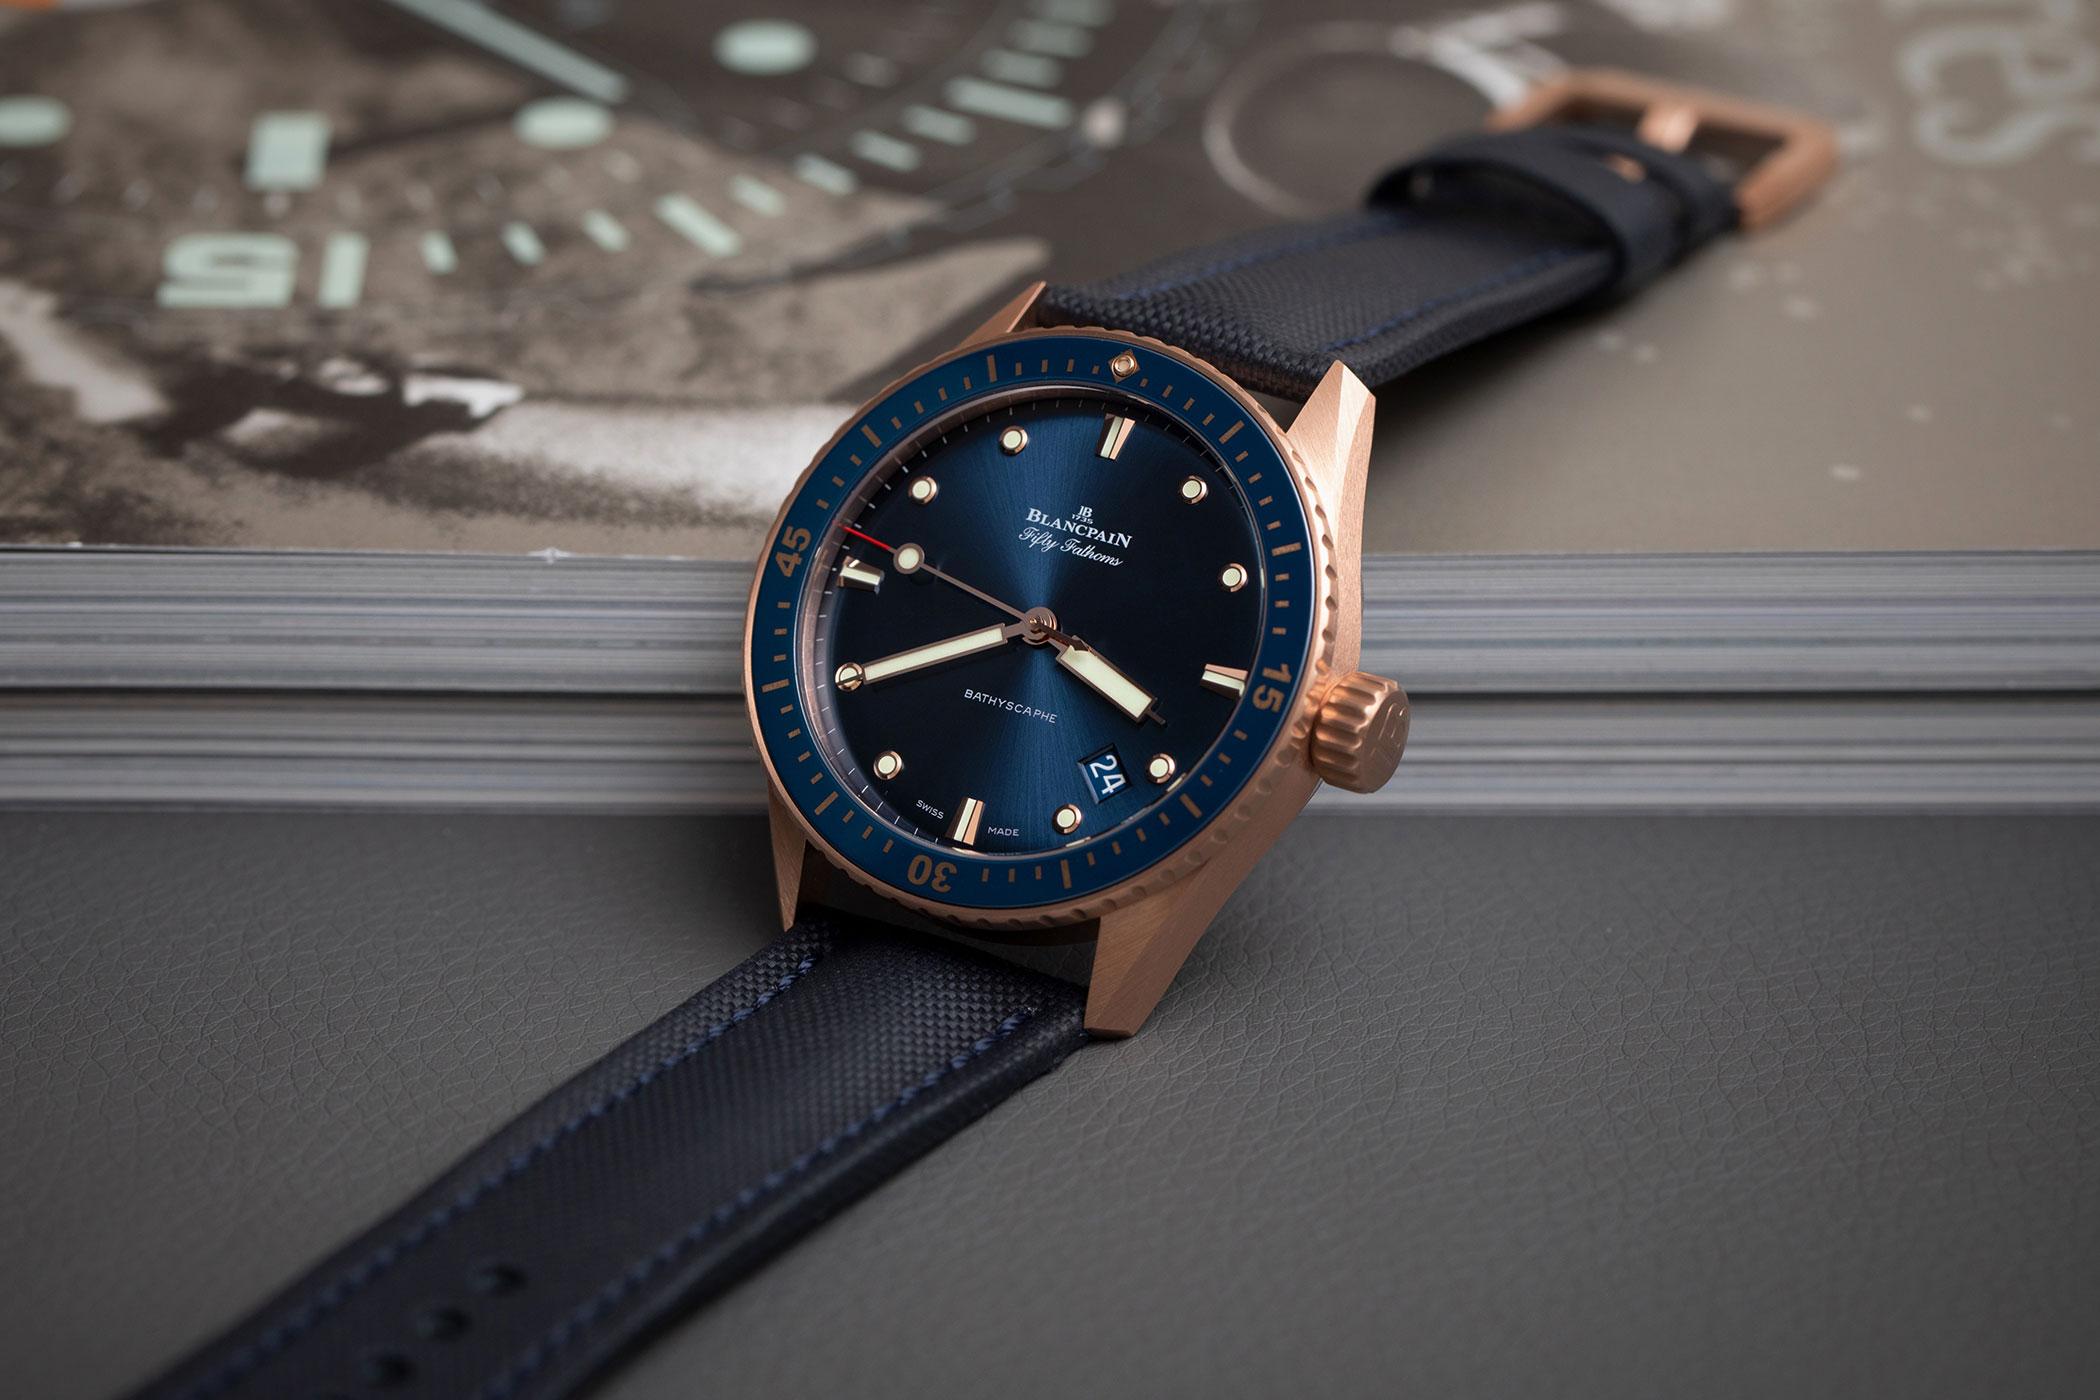 Blancpain-Fifty-Fathoms-Bathyscaphe-5000-36S40-Sedna-Gold-Blue-Dial-05.jpg